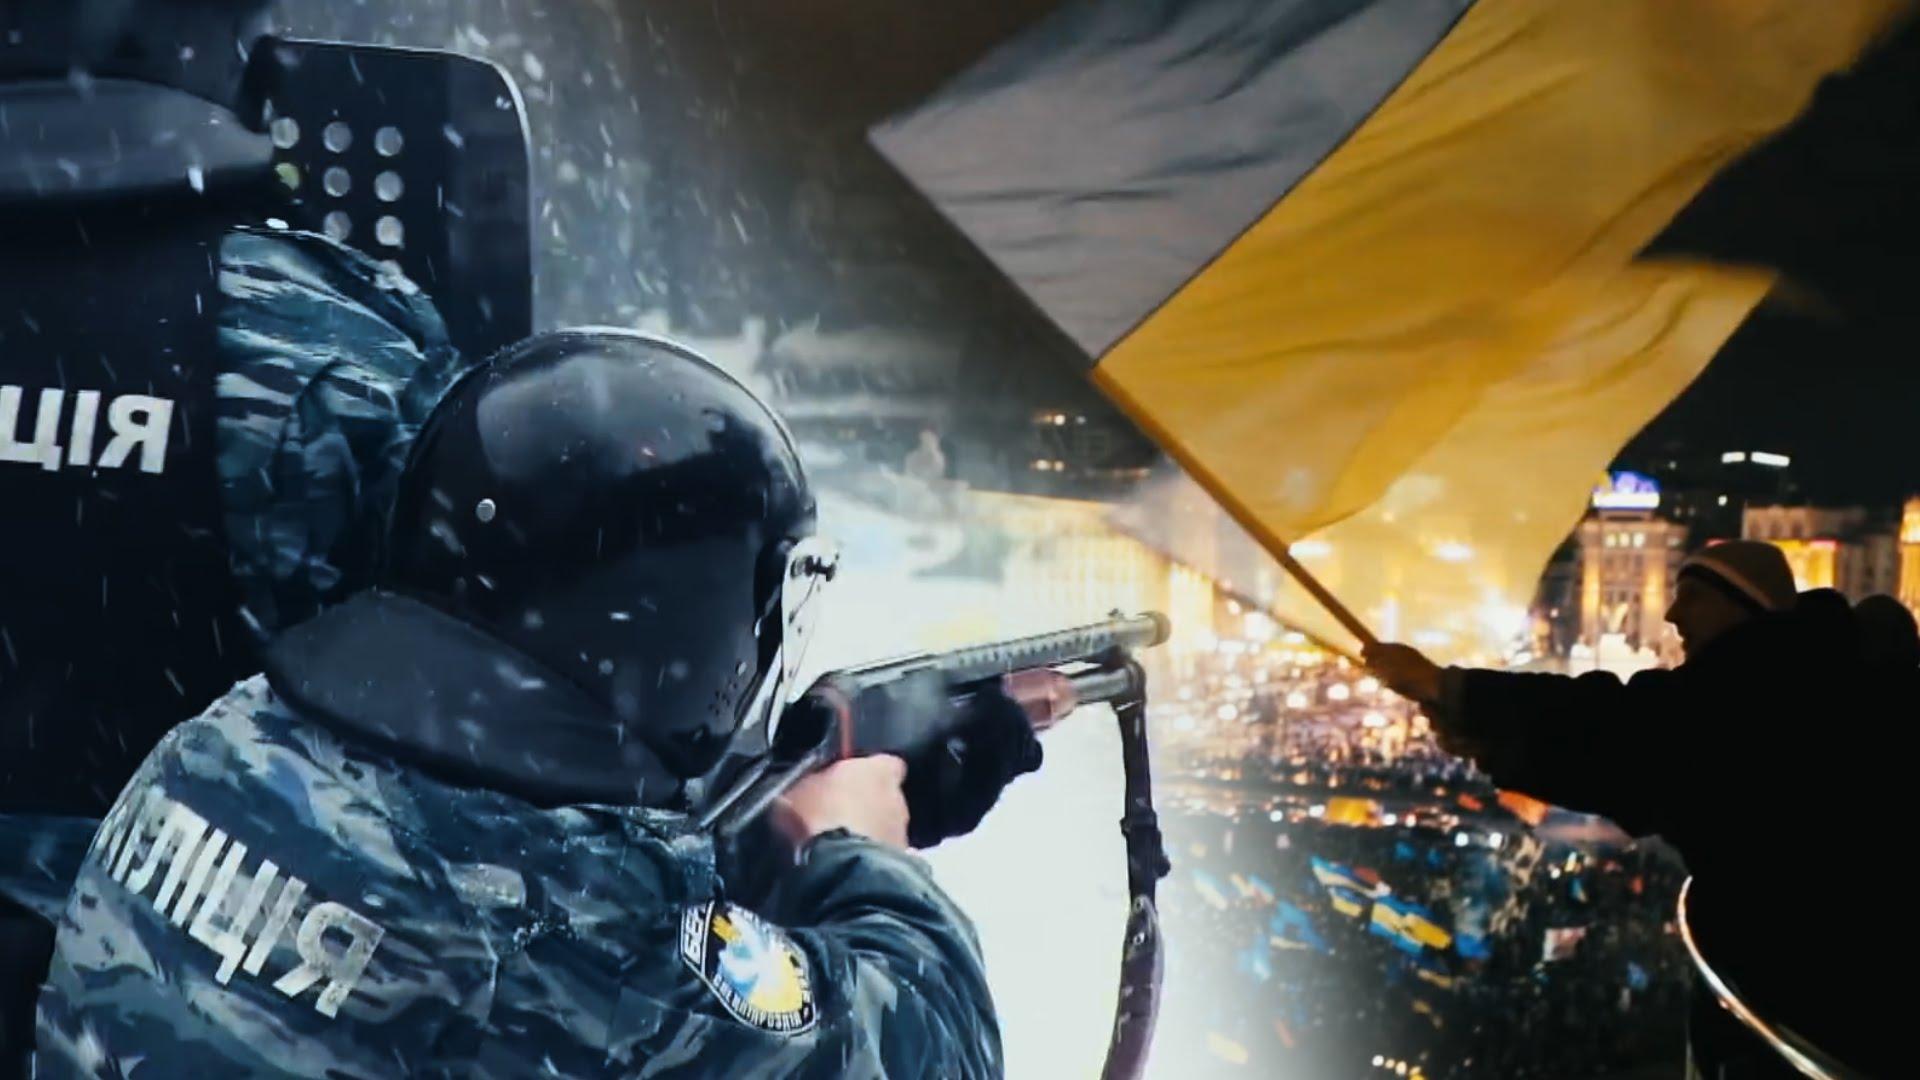 Ukrainian police fire on unarmed protesters.